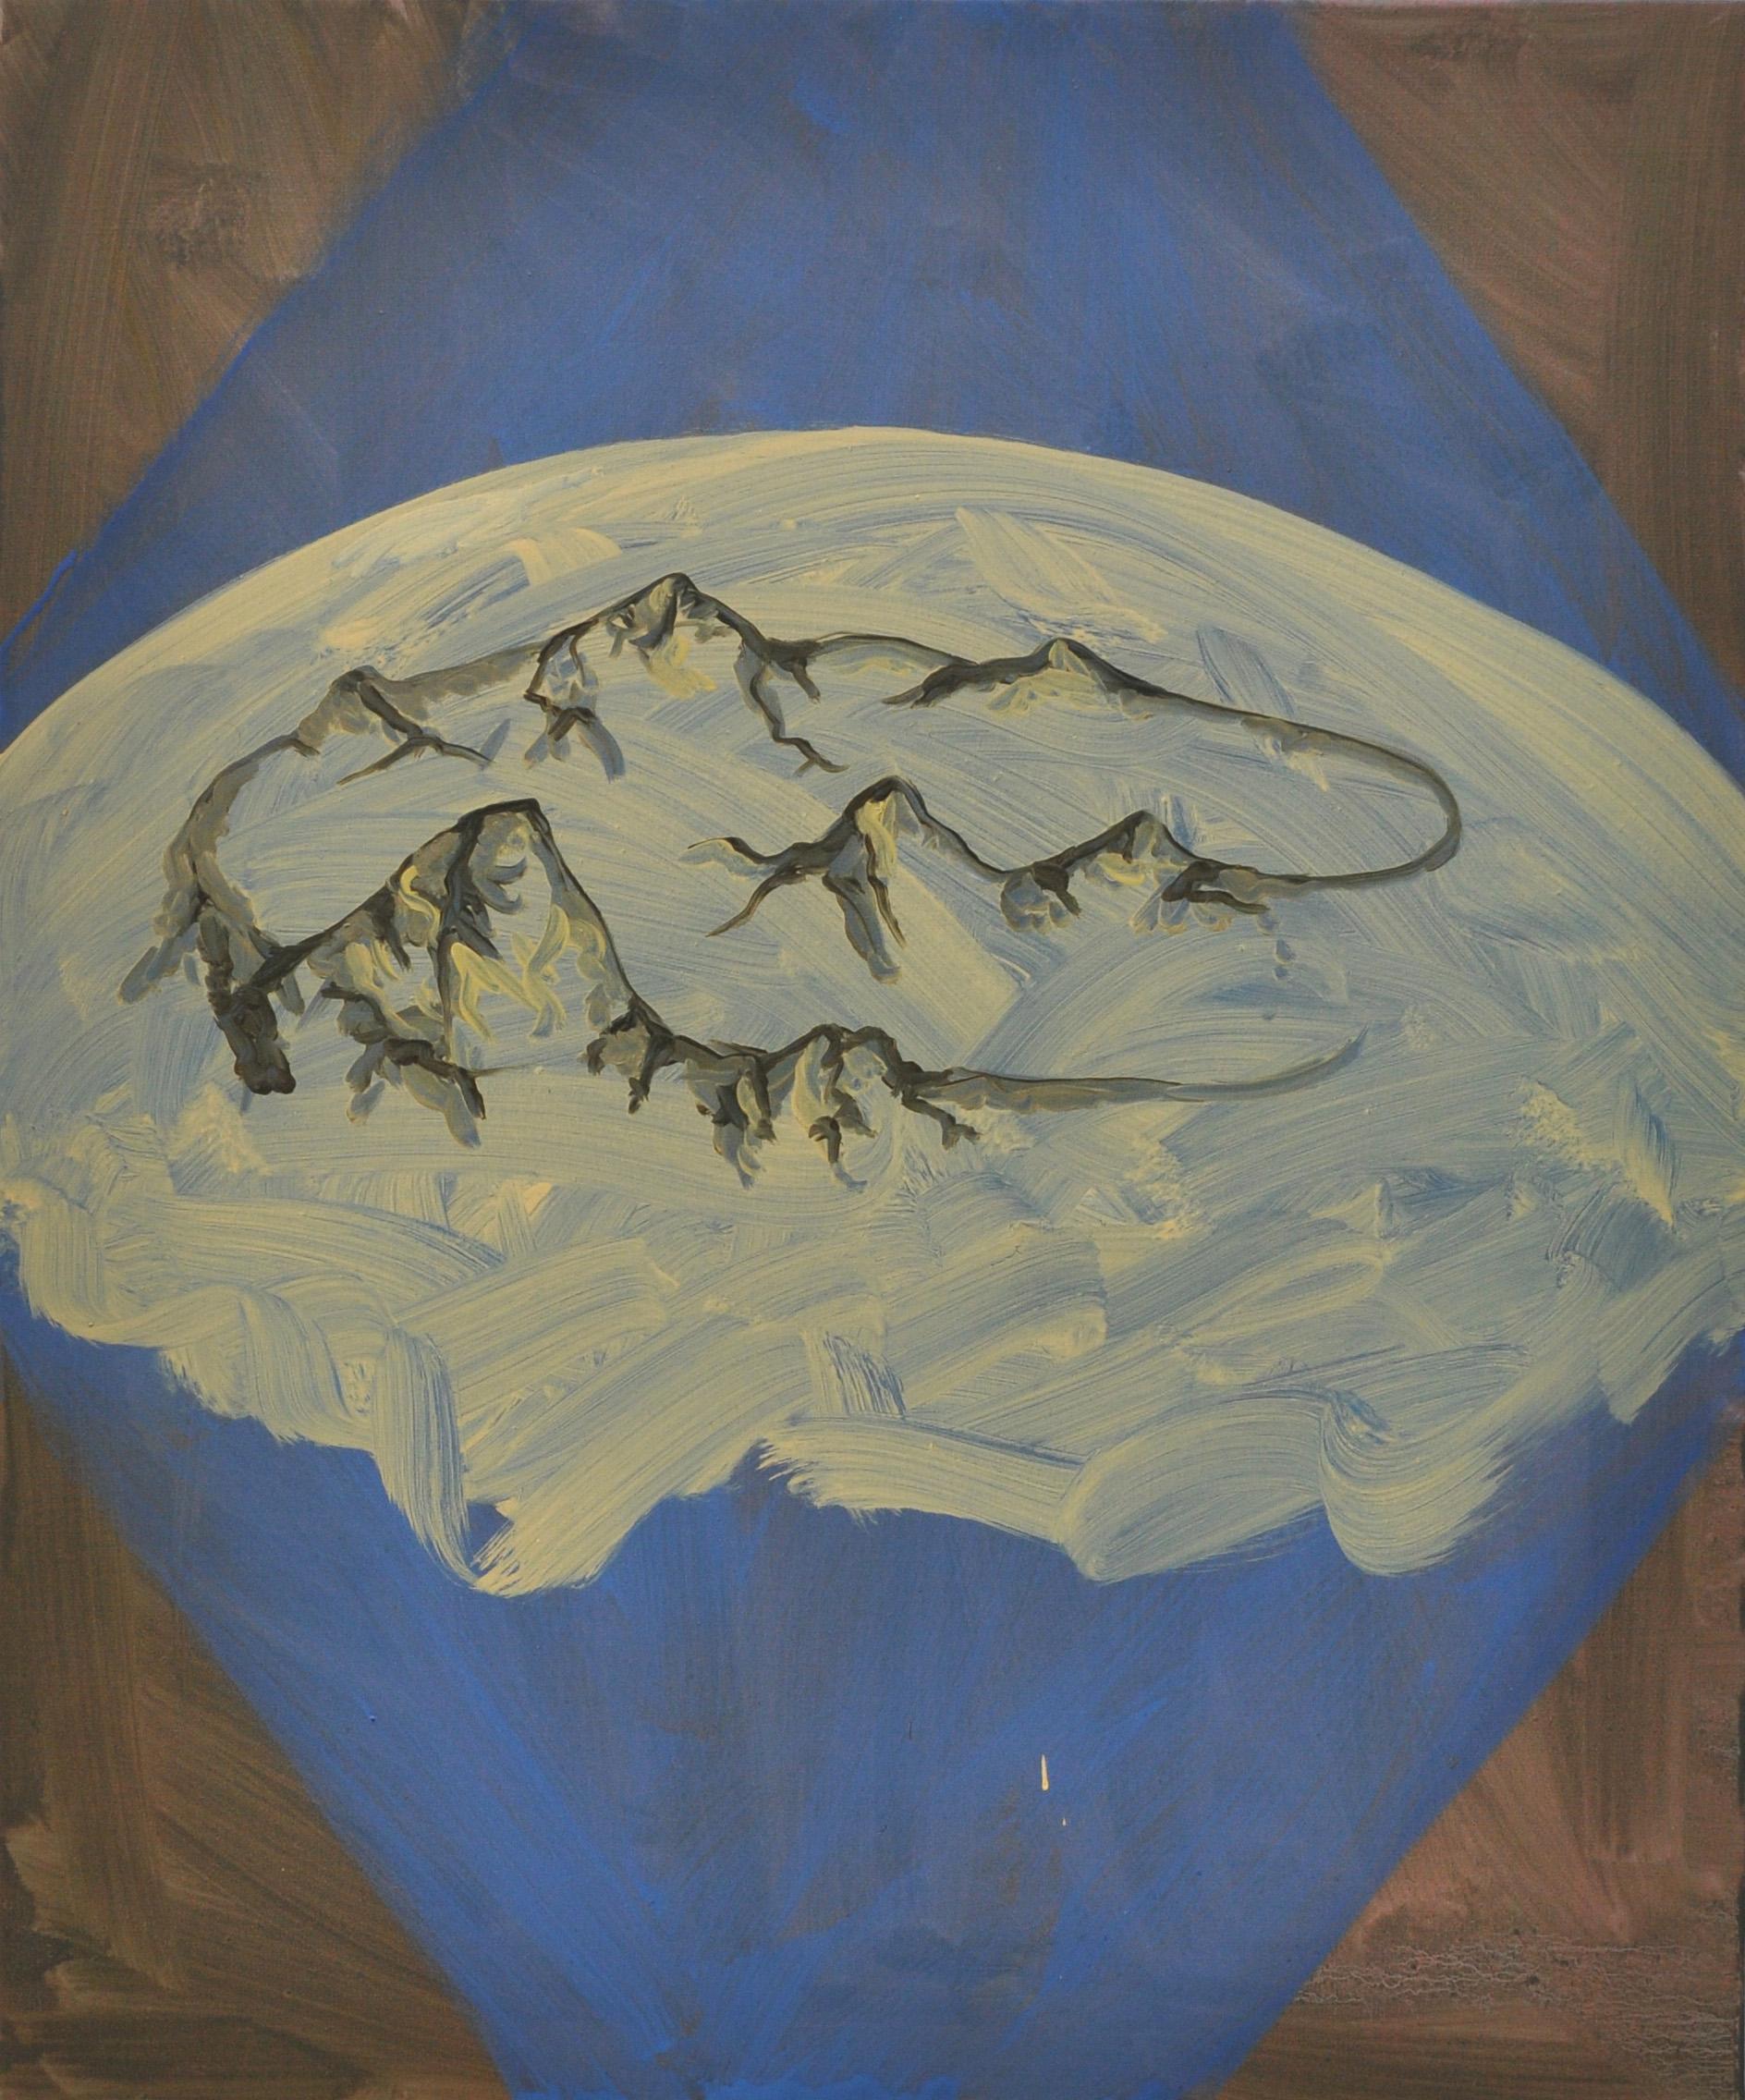 Cyclical Mountains, 2011, Oil on cotton, 60 x 50 cm